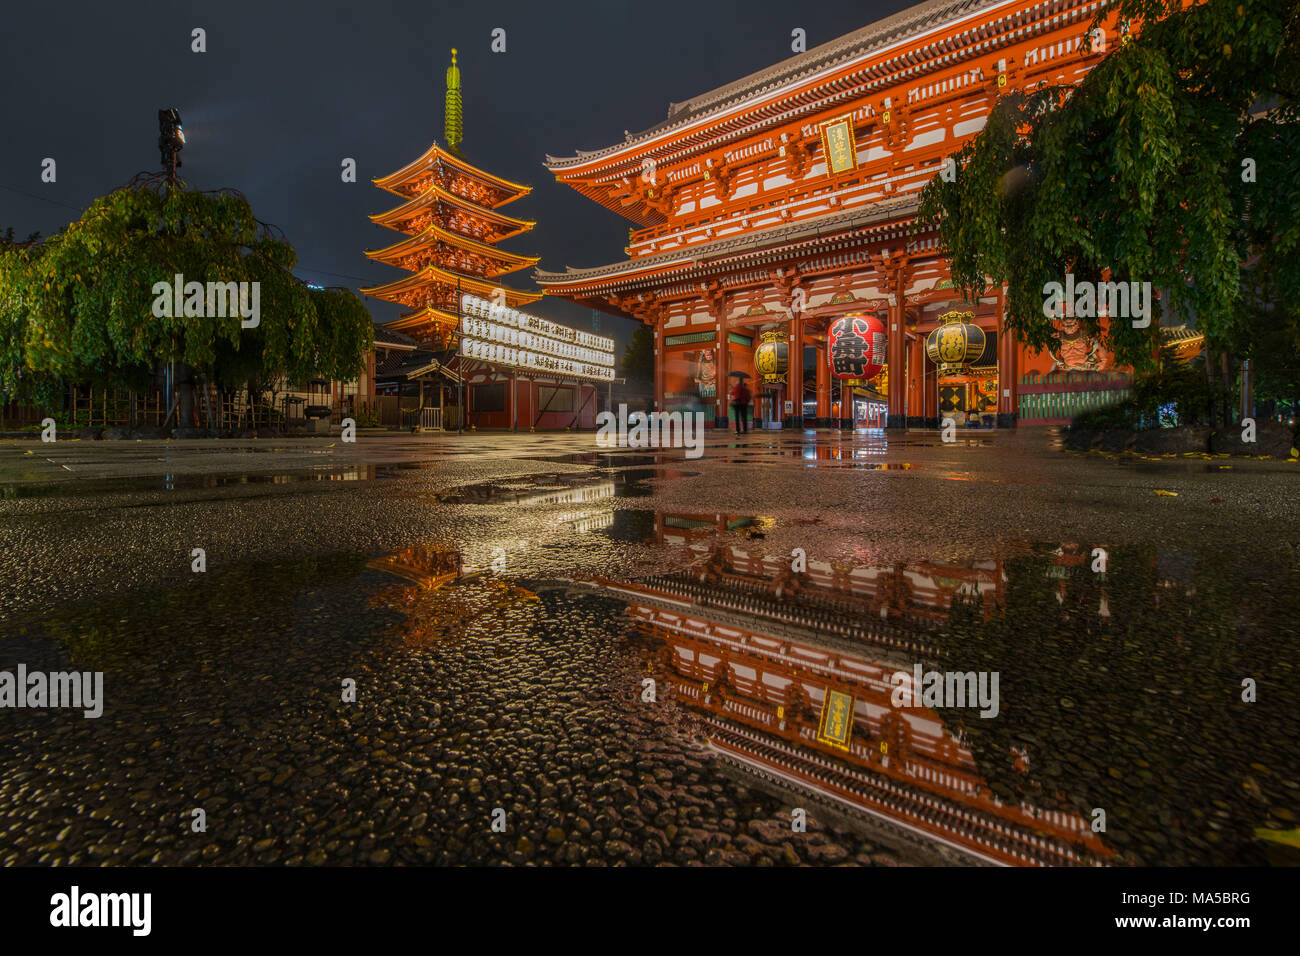 Asia, Japan, Nihon, Nippon, Tokyo, Taito, Asakusa, Sens?-ji temple complex with pagoda - Stock Image